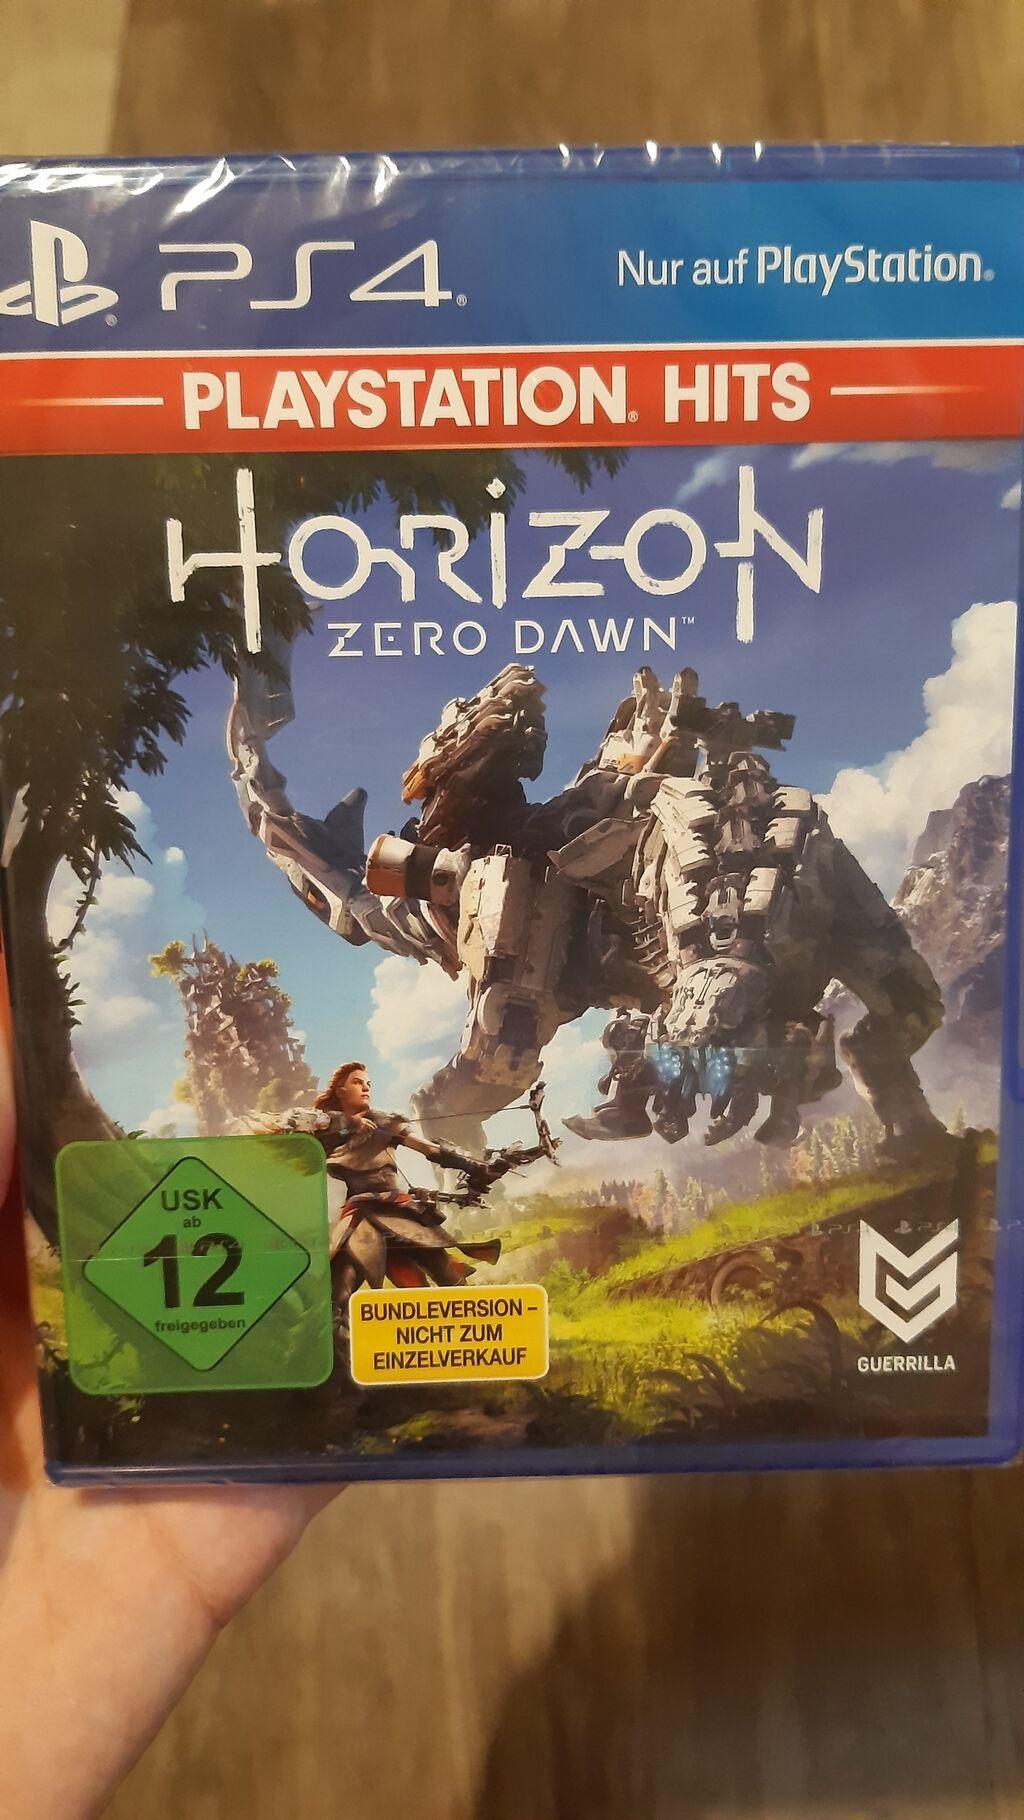 HORIZON ZERO DAWN Igrica za PS4 nova neotpakovana u celofanu   Oglas postavljen 17 Jul 2021 01:48:59: HORIZON ZERO DAWN Igrica za PS4 nova neotpakovana u celofanu